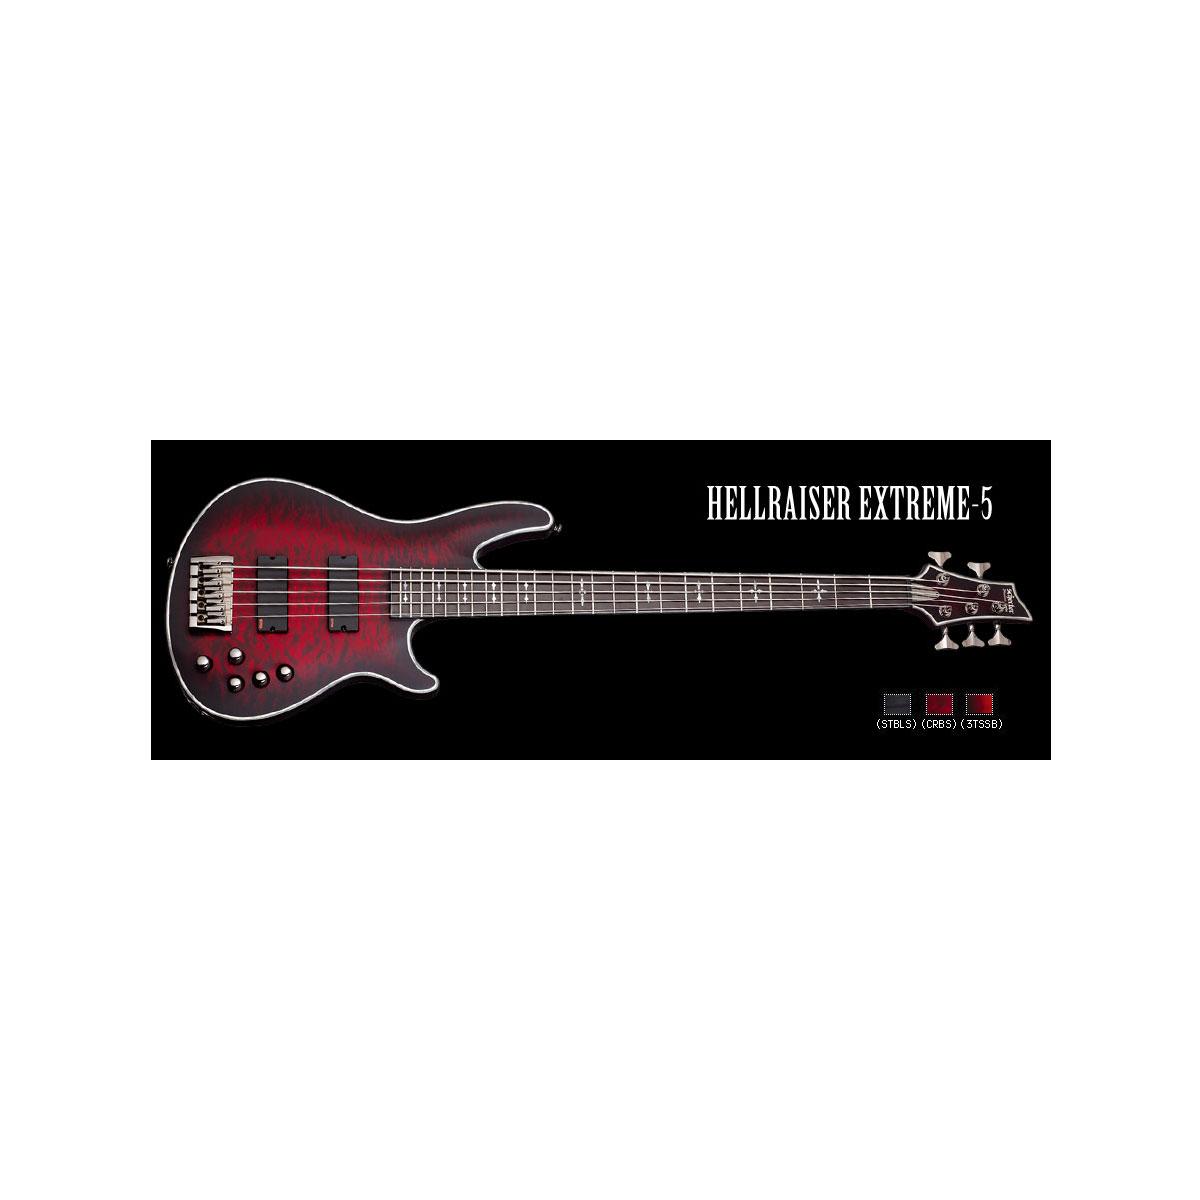 Schecter / HELLRAISER EXTREME 5 Crimson Red Burst シェクター 5弦ベース 【お取り寄せ商品】